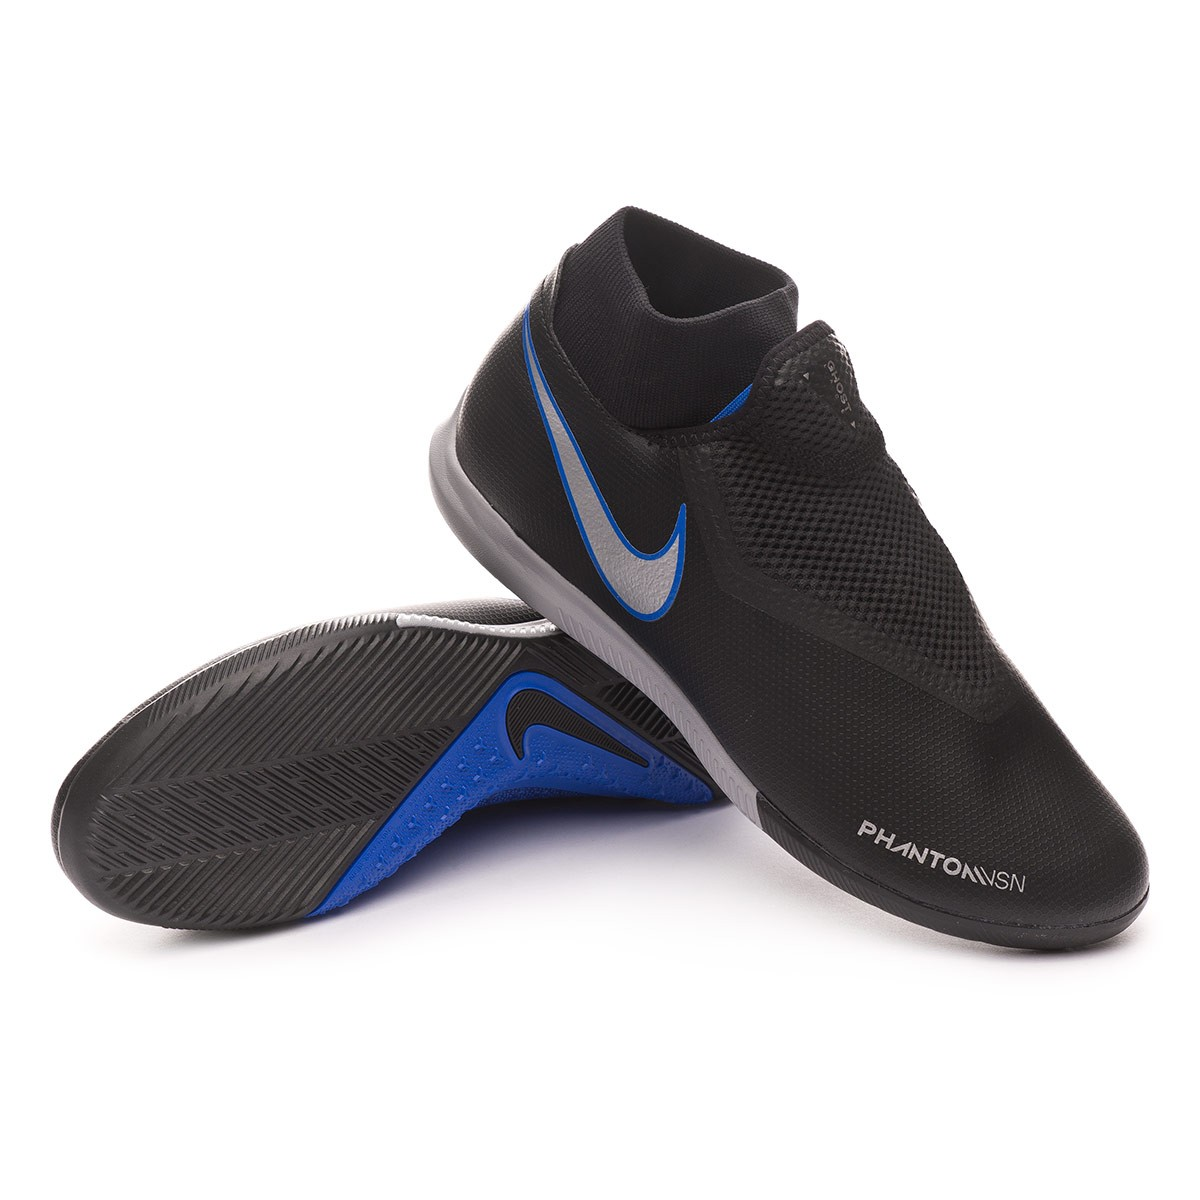 966c85b42b4 Nike Phantom Vision Academy DF IC Futsal Boot. Black-Metallic silver-Racer  blue ...